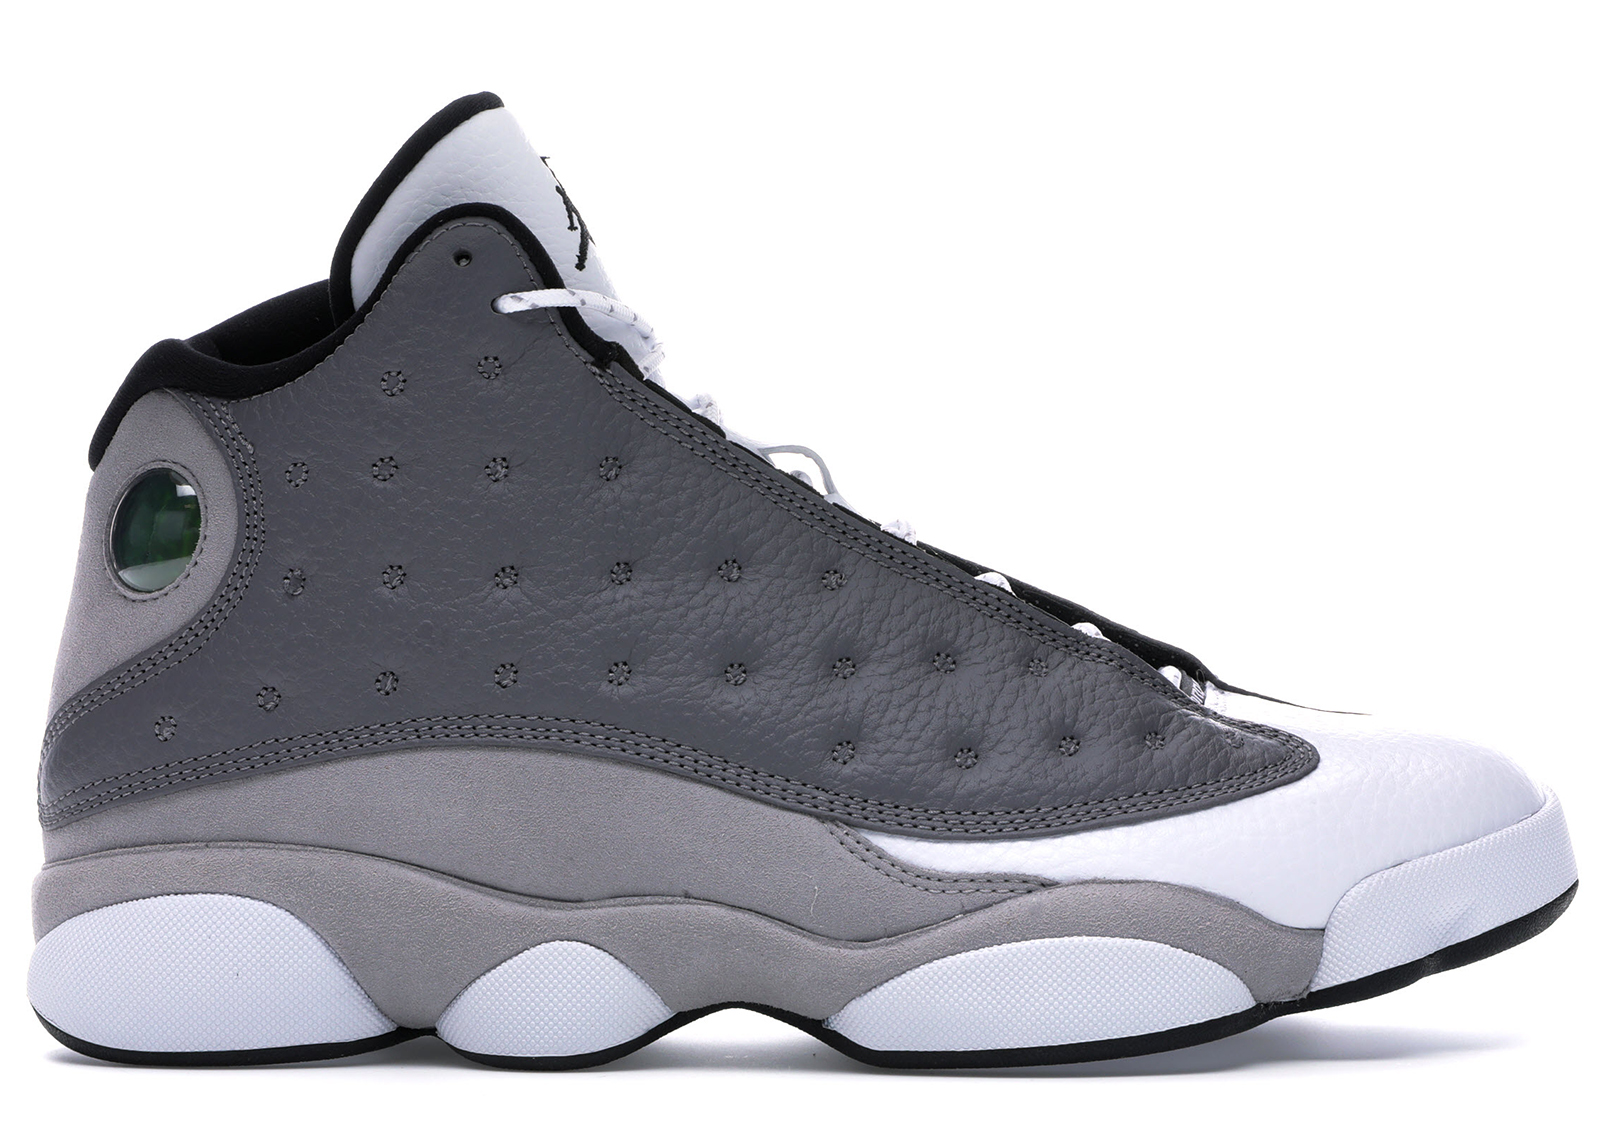 Jordan 13 Retro Atmosphere Grey - 414571-016